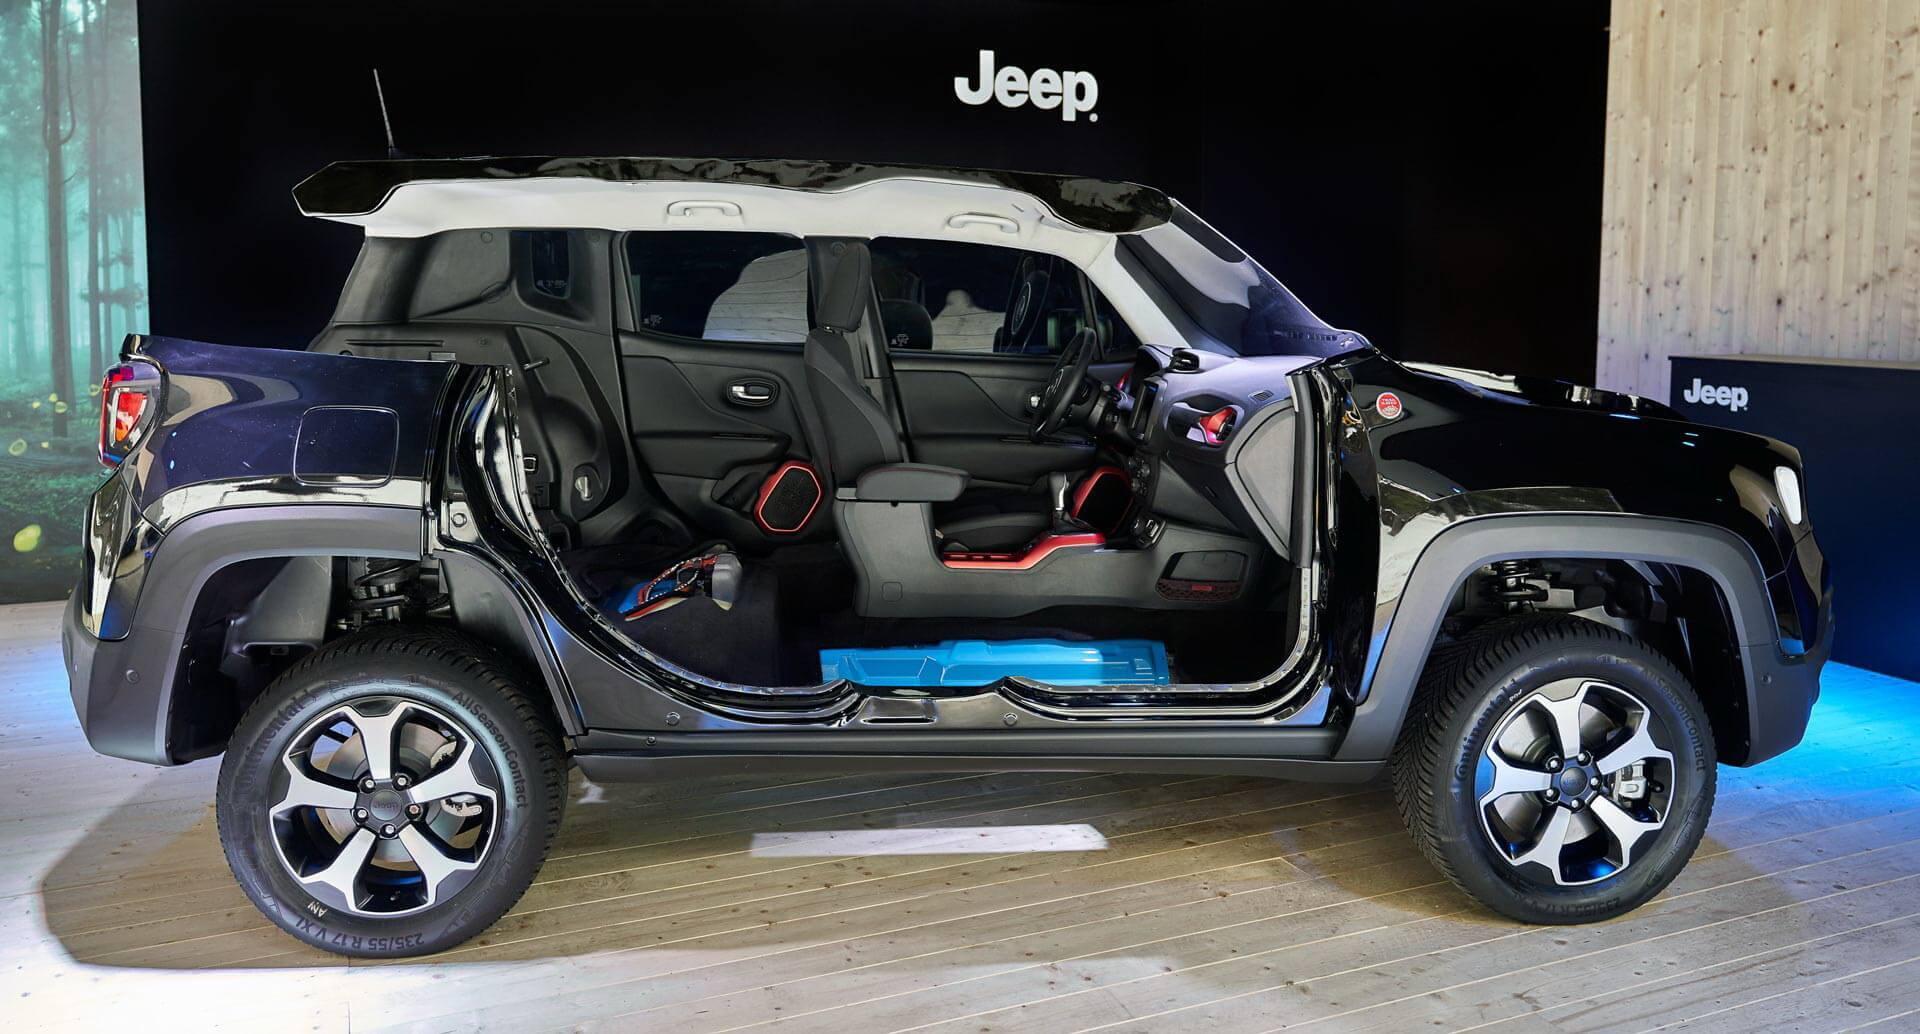 Плагин-гибрид Jeep Renegade 4xe в разрезе